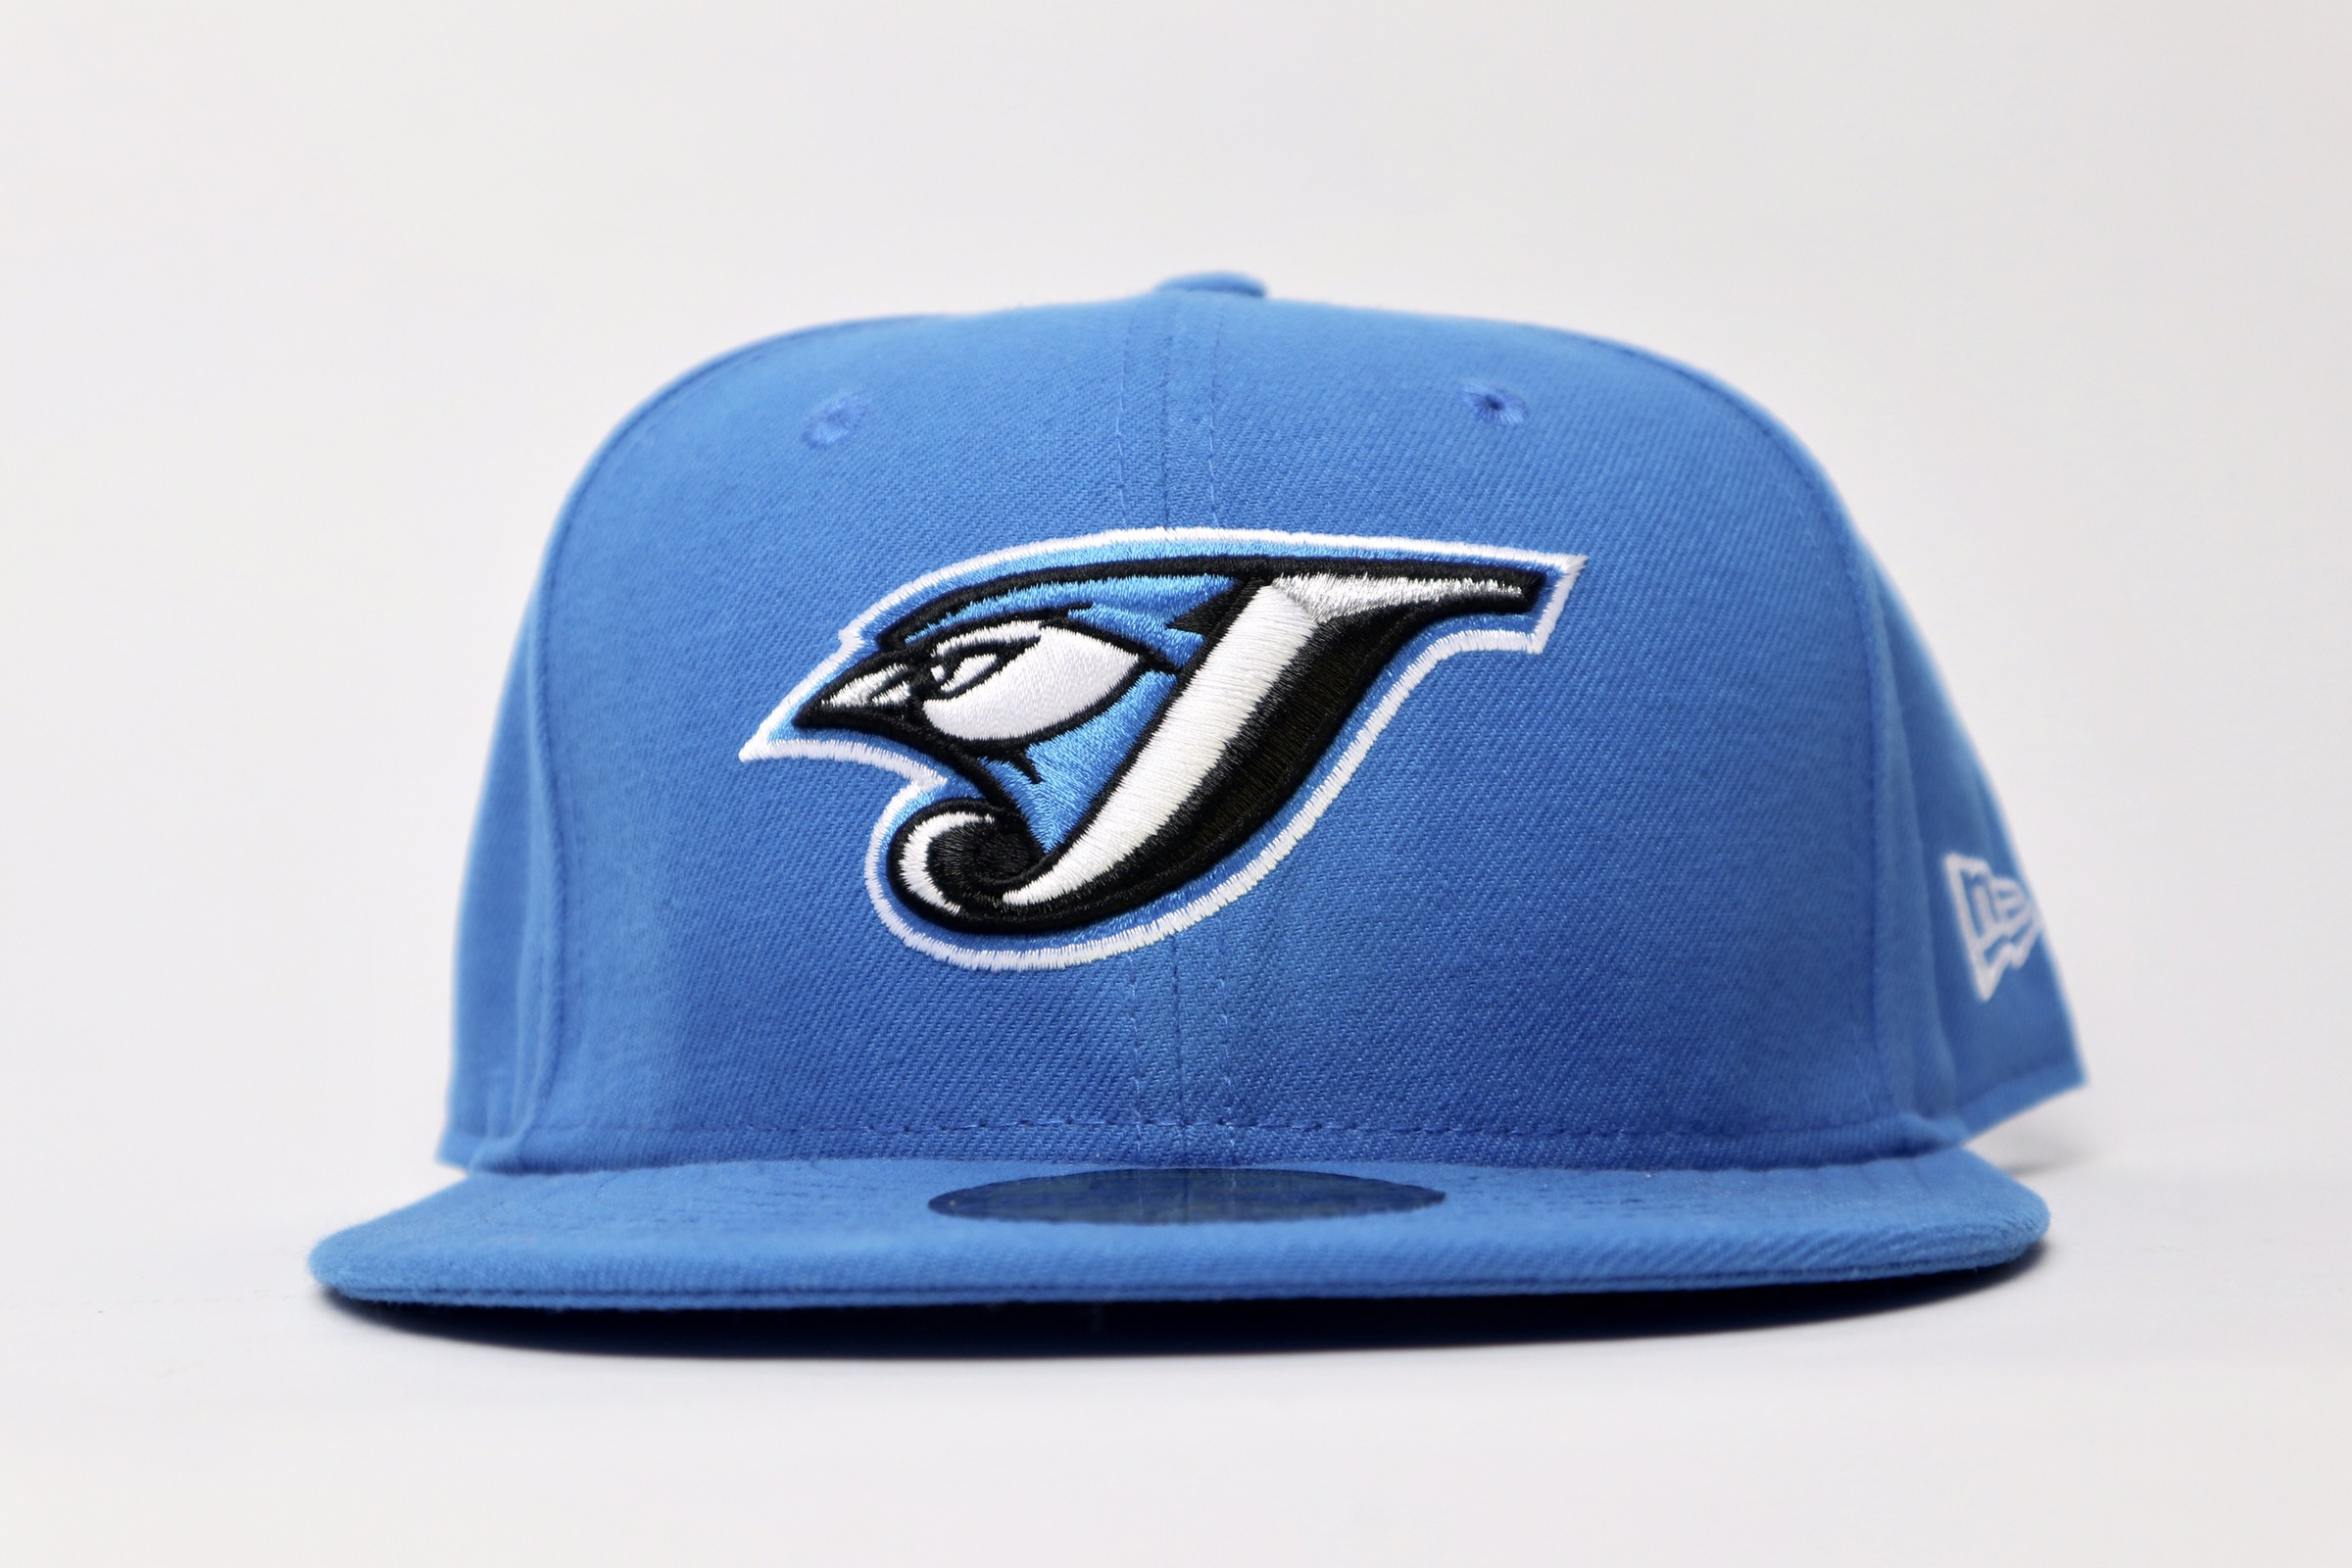 new era new era toronto blue jays hat mens 7 1 4 fifty nine